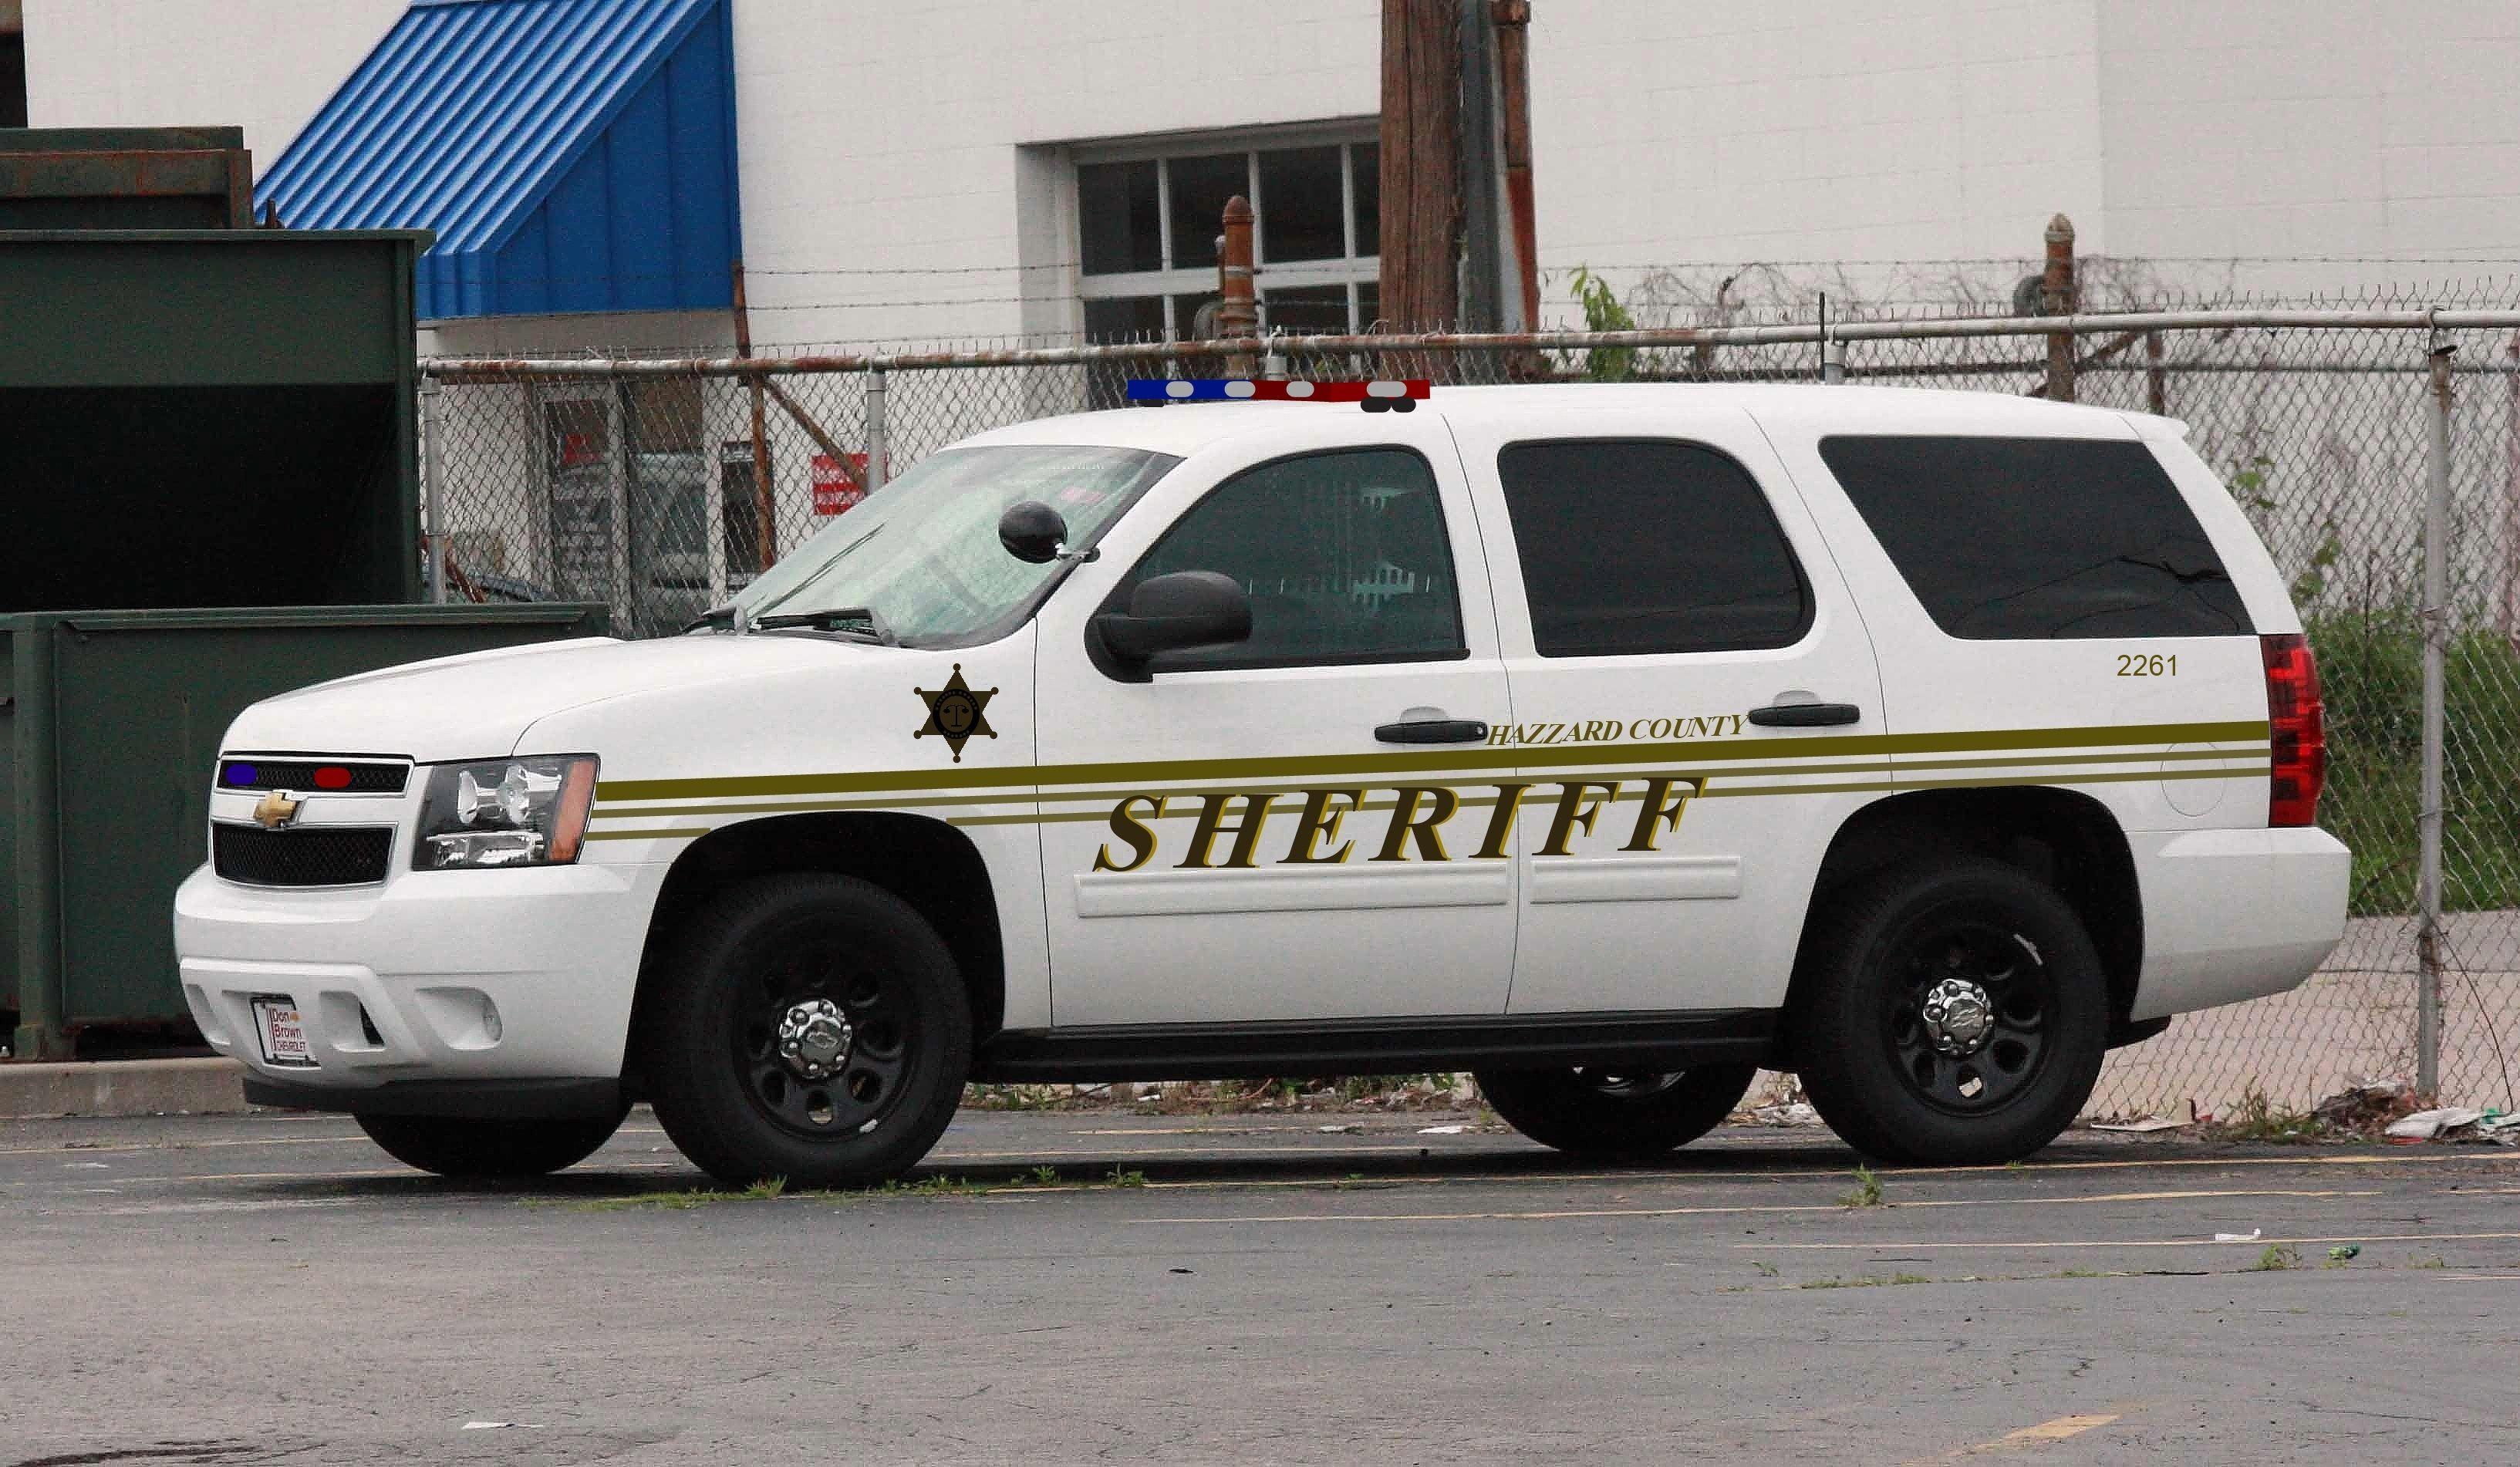 Hazzard County Sheriff Chevy Tahoe | Modern Dukes Of Hazzard